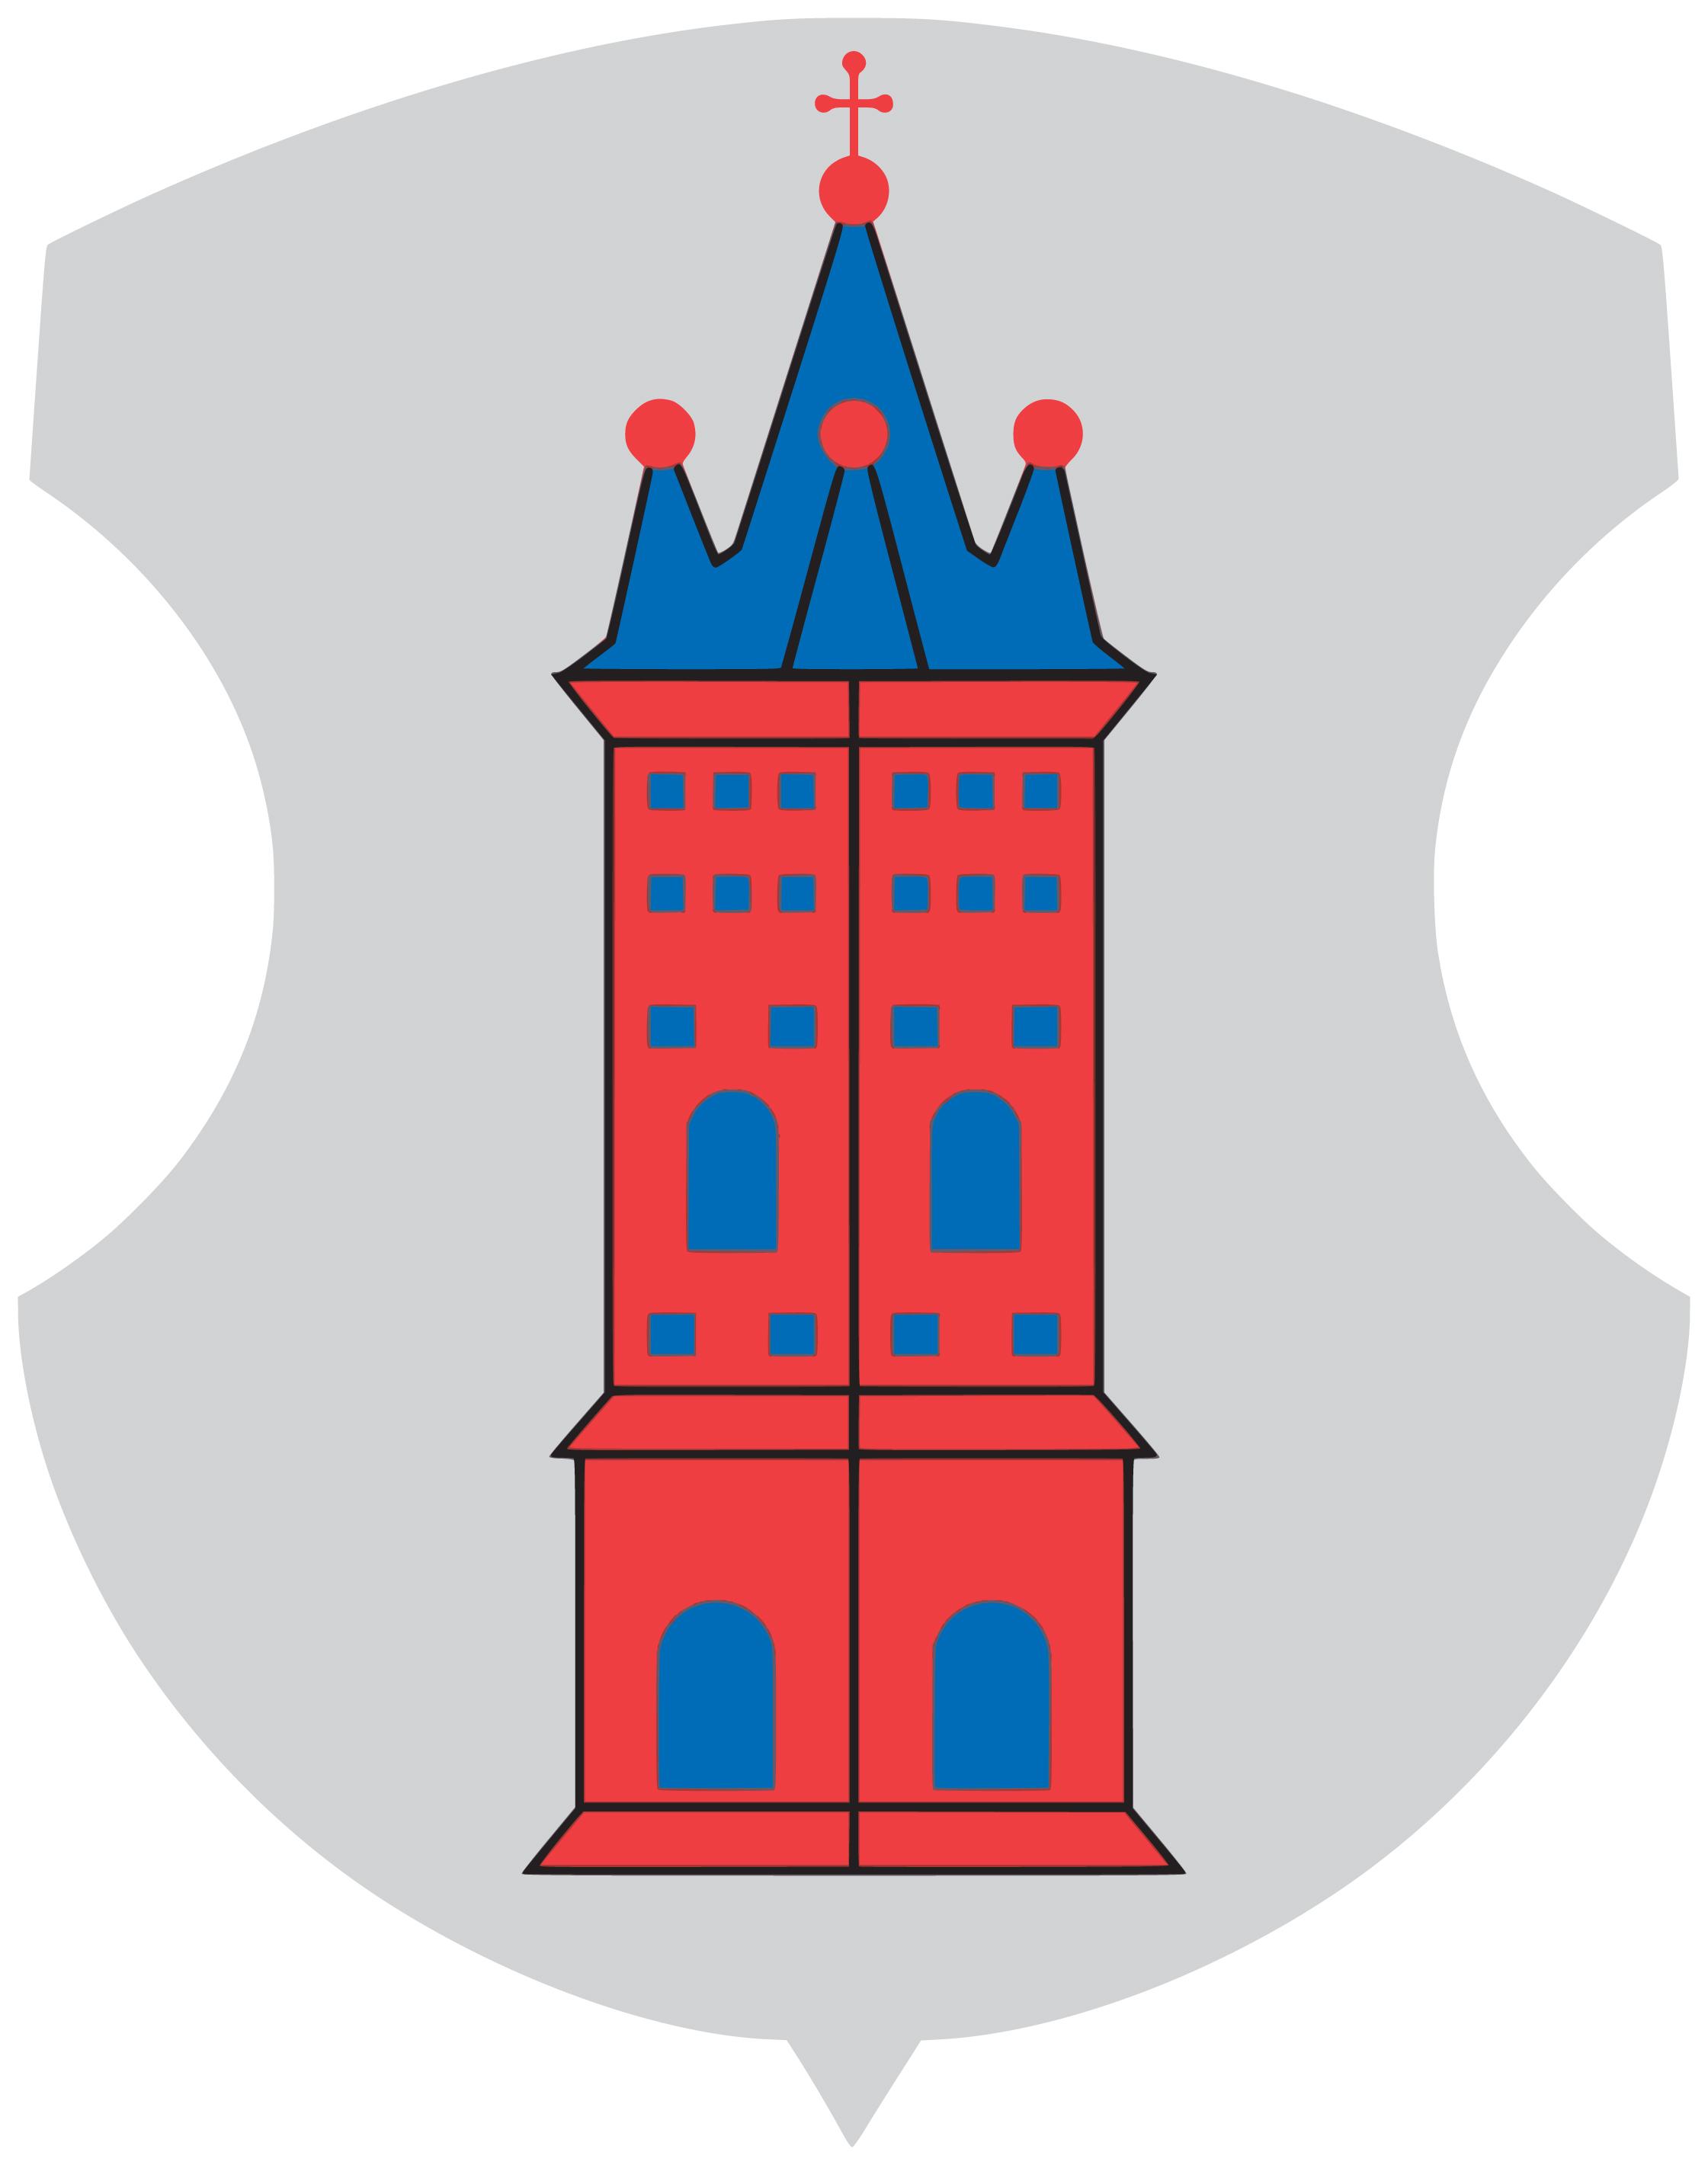 Tornion Kaupungintalo